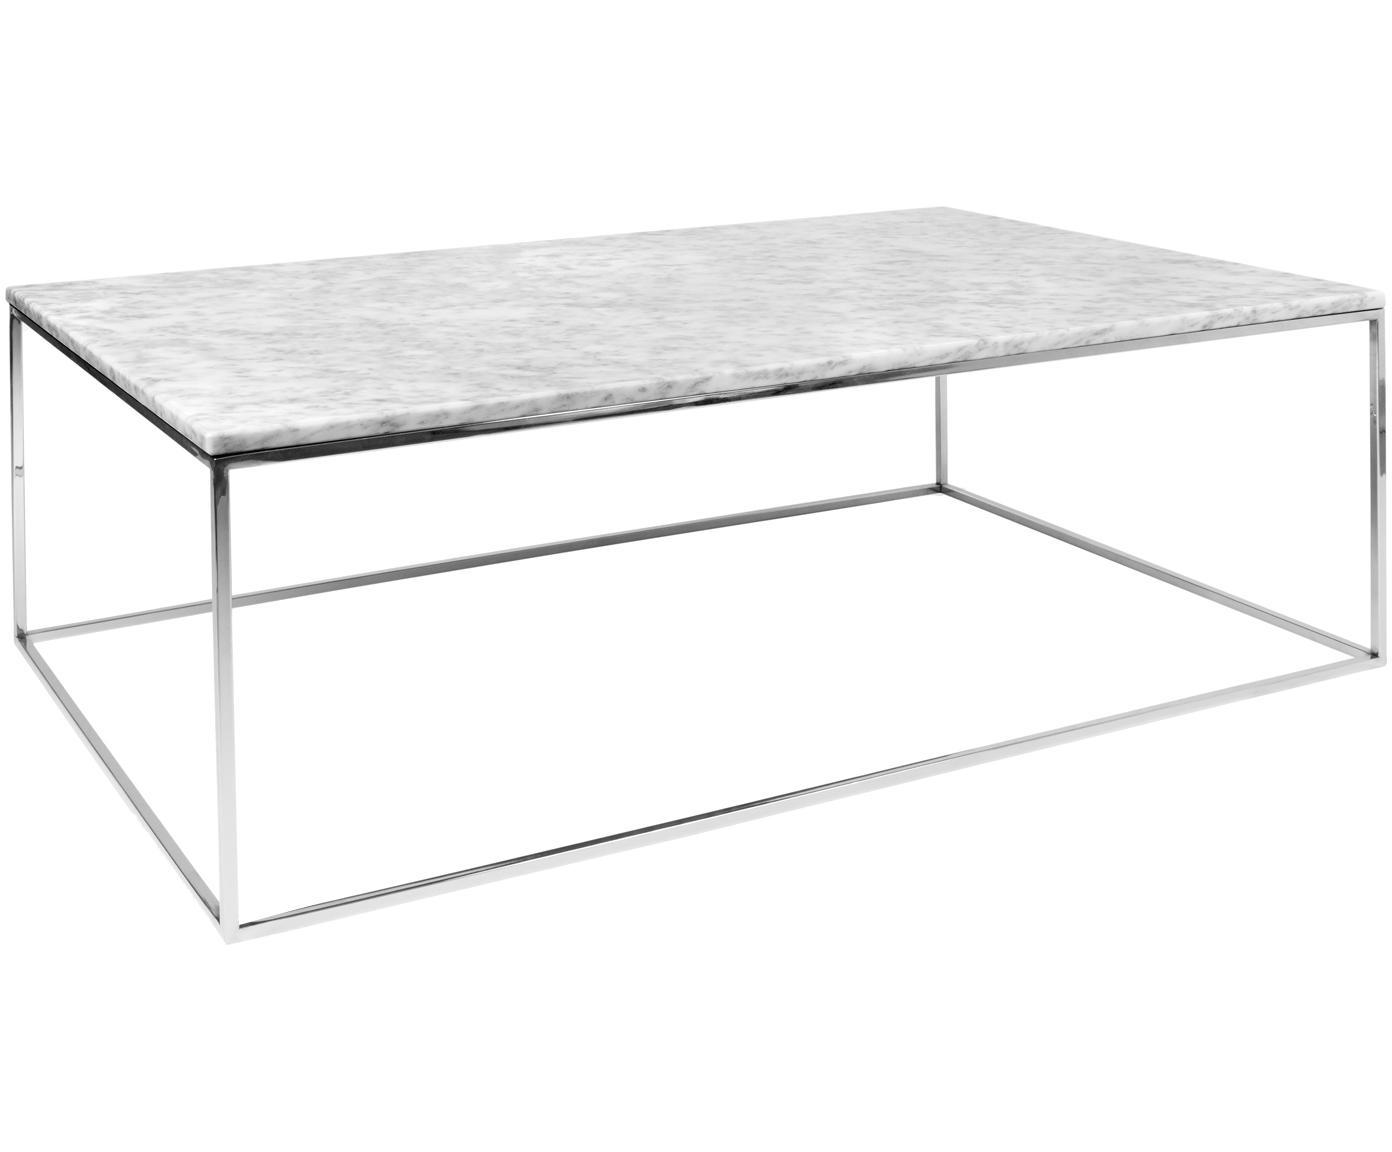 Marmeren salontafel Gleam, Tafelblad: marmer, Frame: verchroomd staal, Tafelblad: gemarmerd wit. Frame: chroomkleurig, 120 x 40 cm